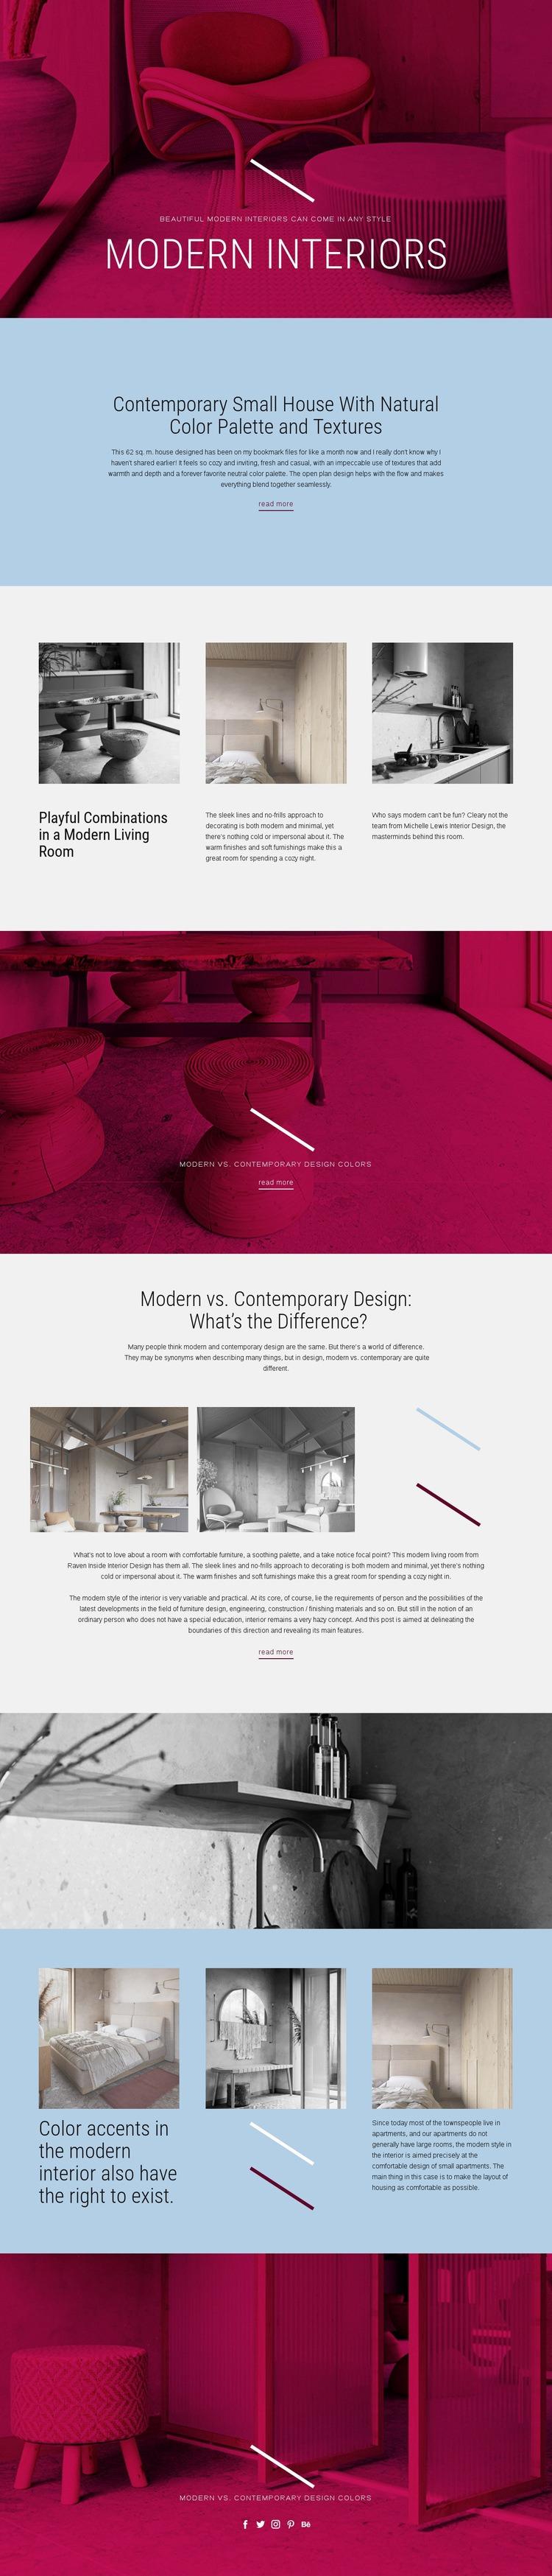 Art Nouveau furniture Html Code Example